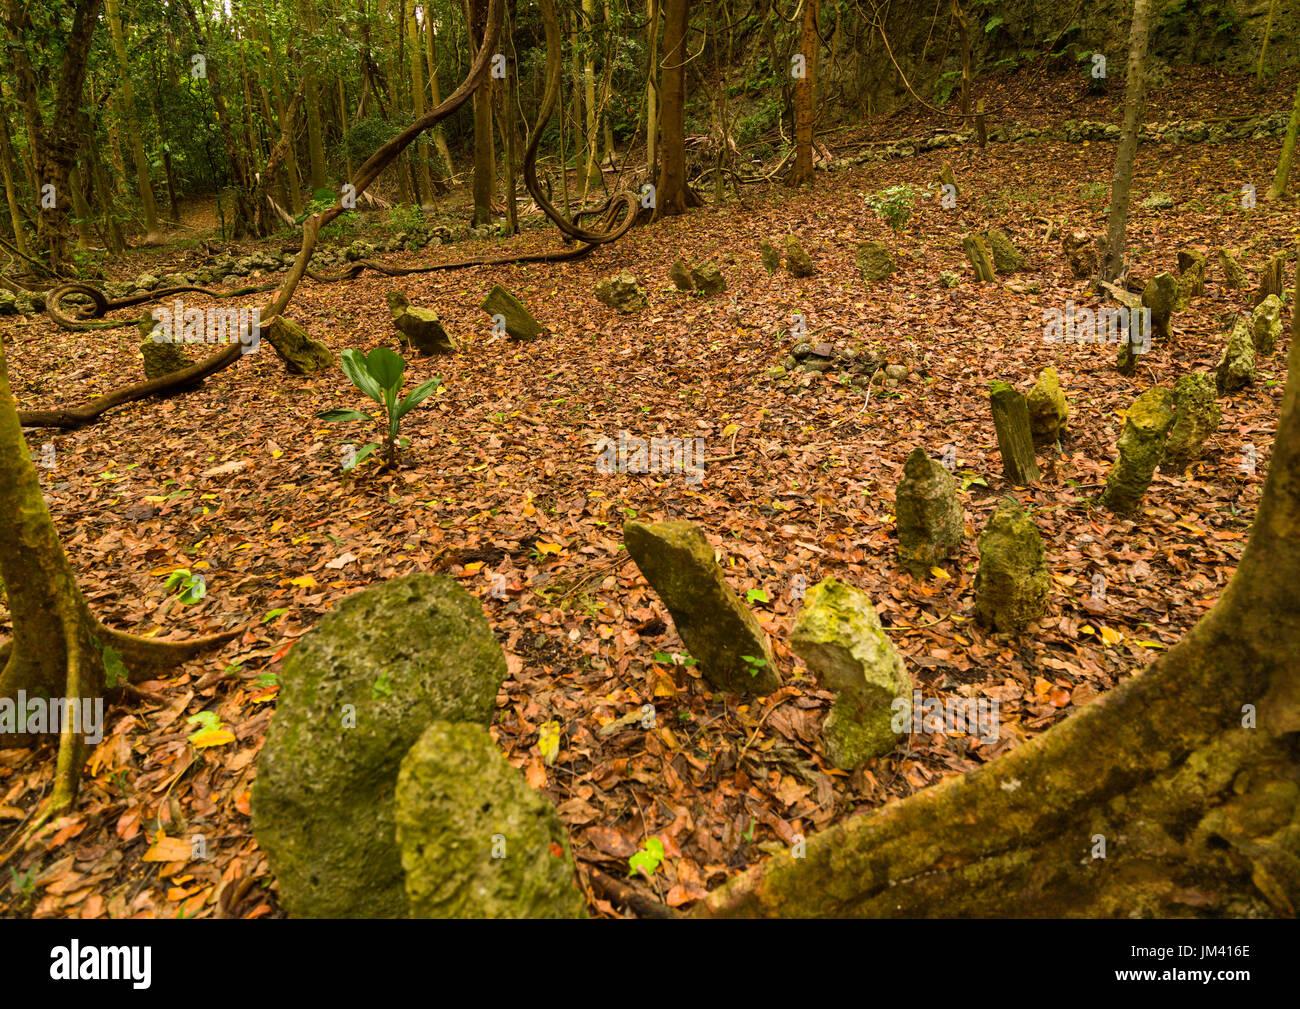 Amelbati site of former cannibal ceremonies, Malampa Province, Malekula Island, Vanuatu - Stock Image